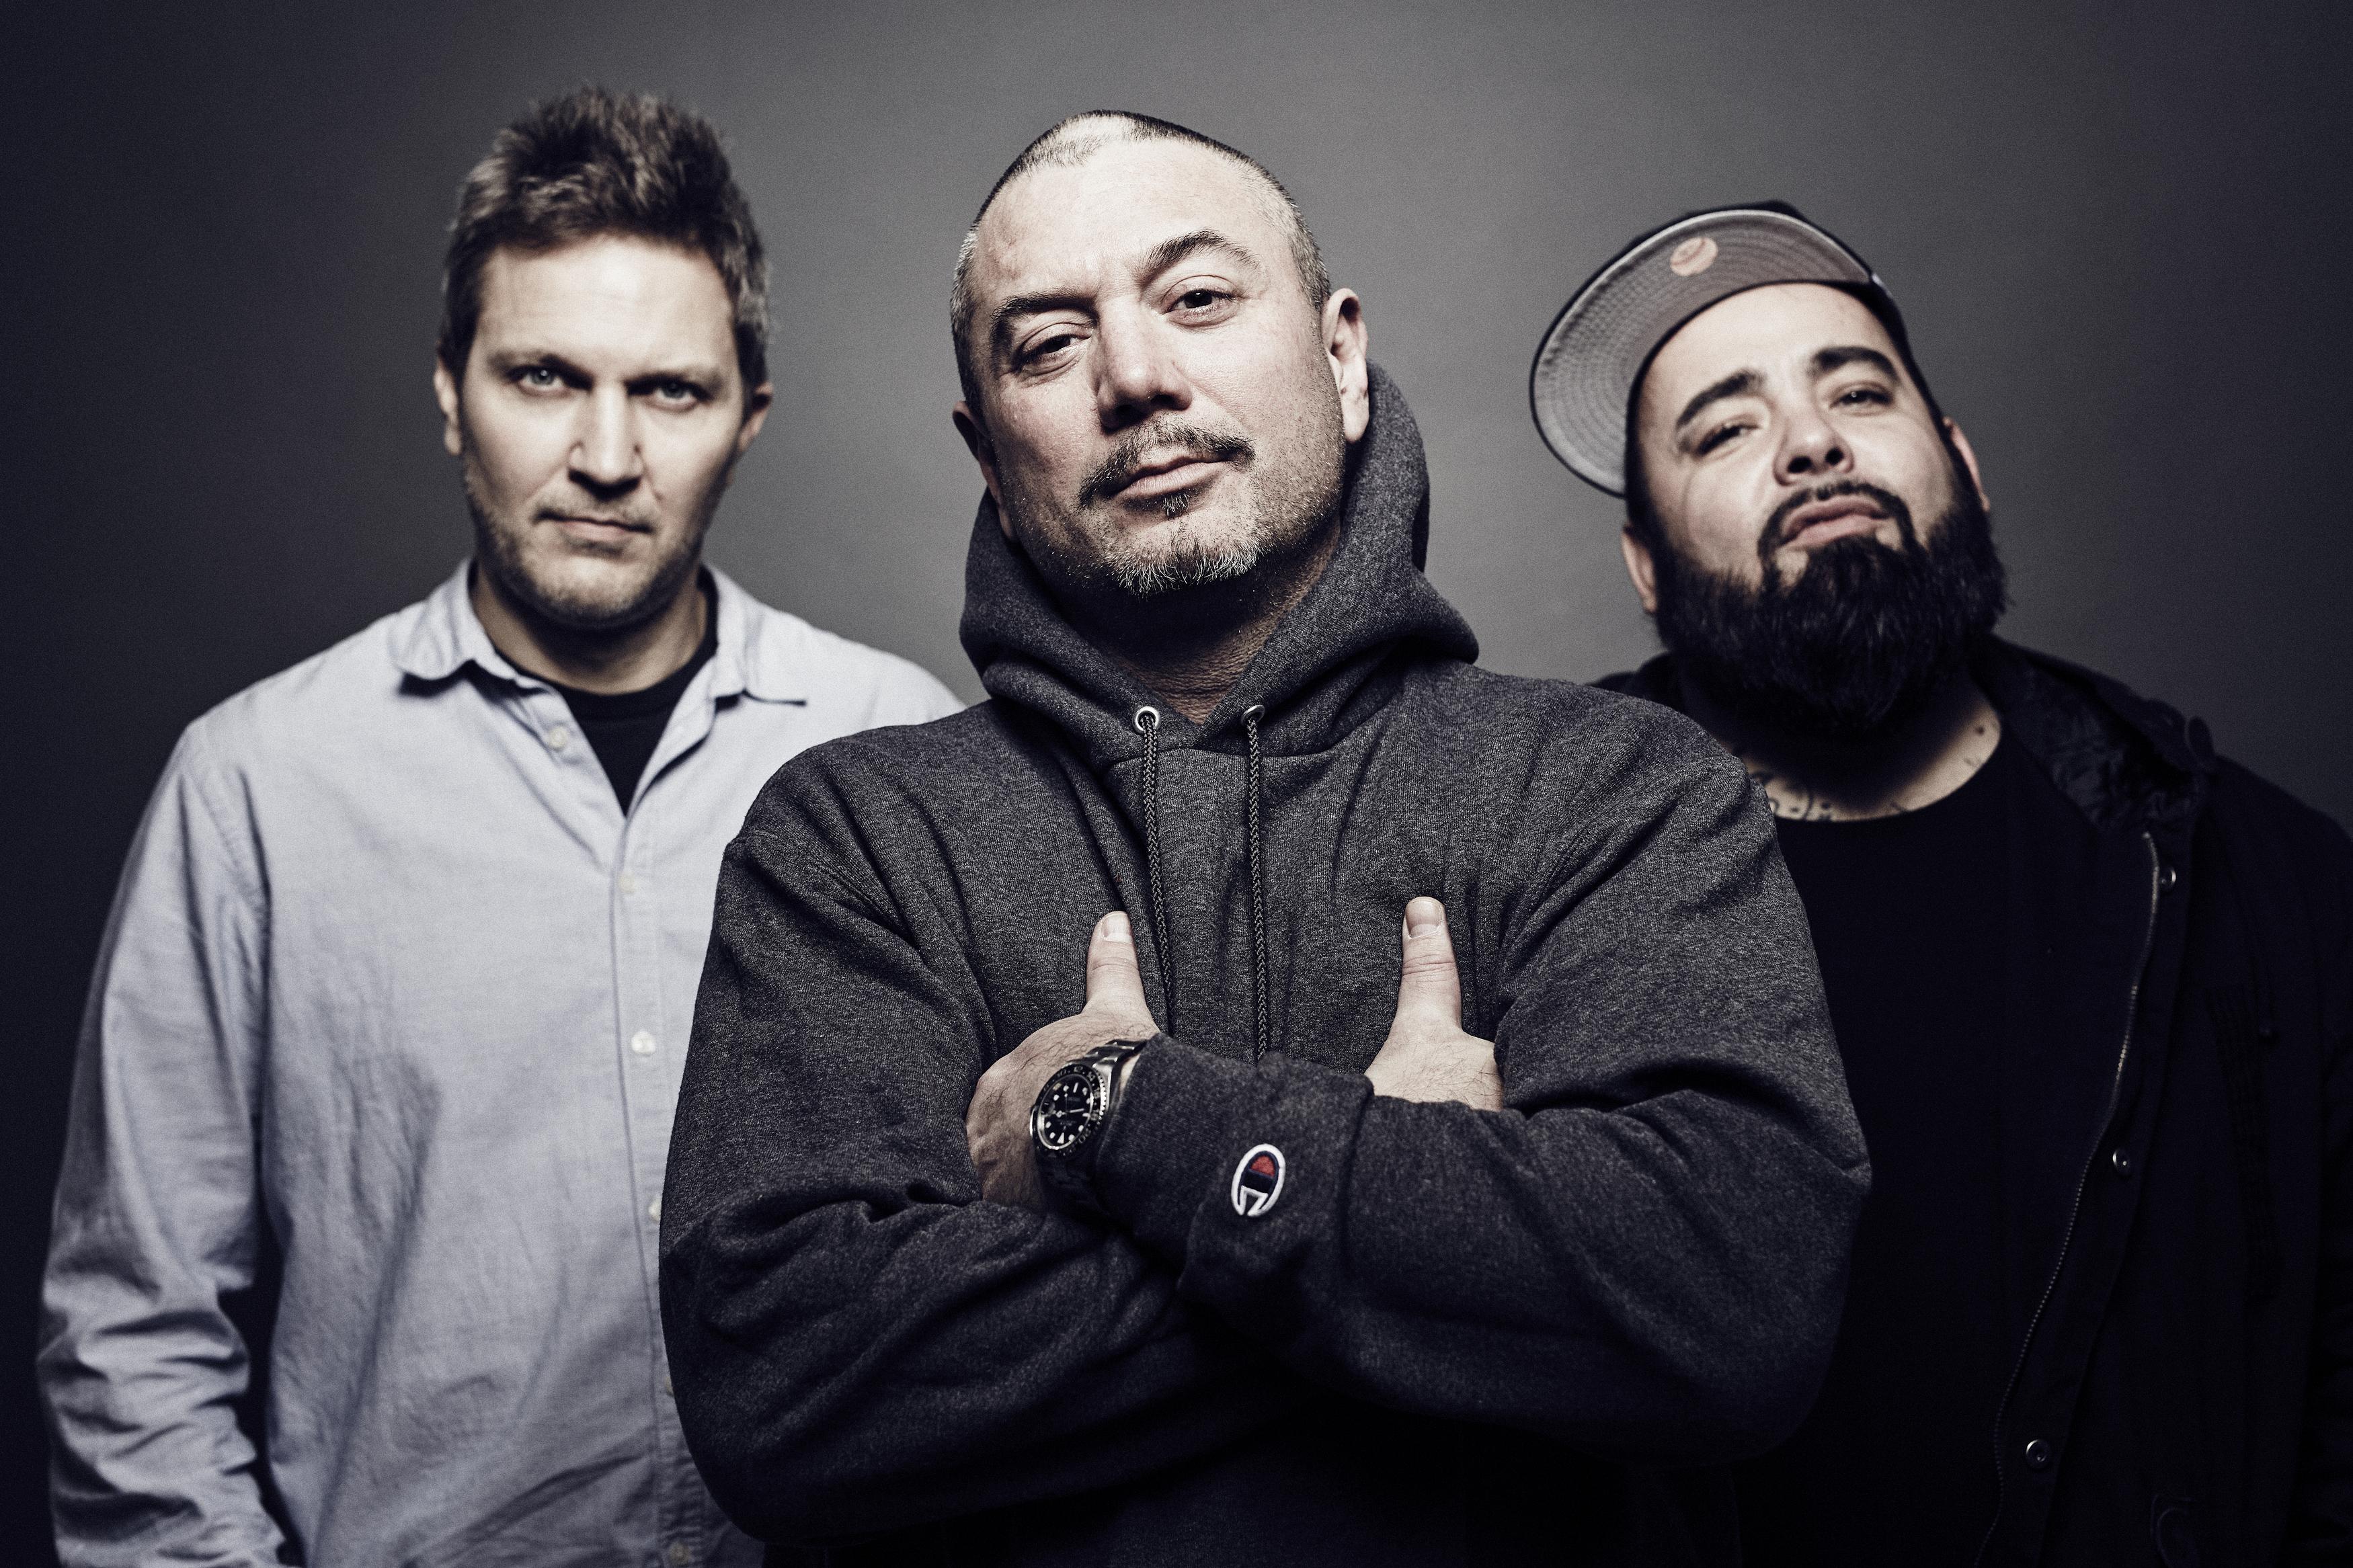 Fun Lovin' Criminals to release 20th Anniversary Deluxe Box Set of 'Come Find Yourself'